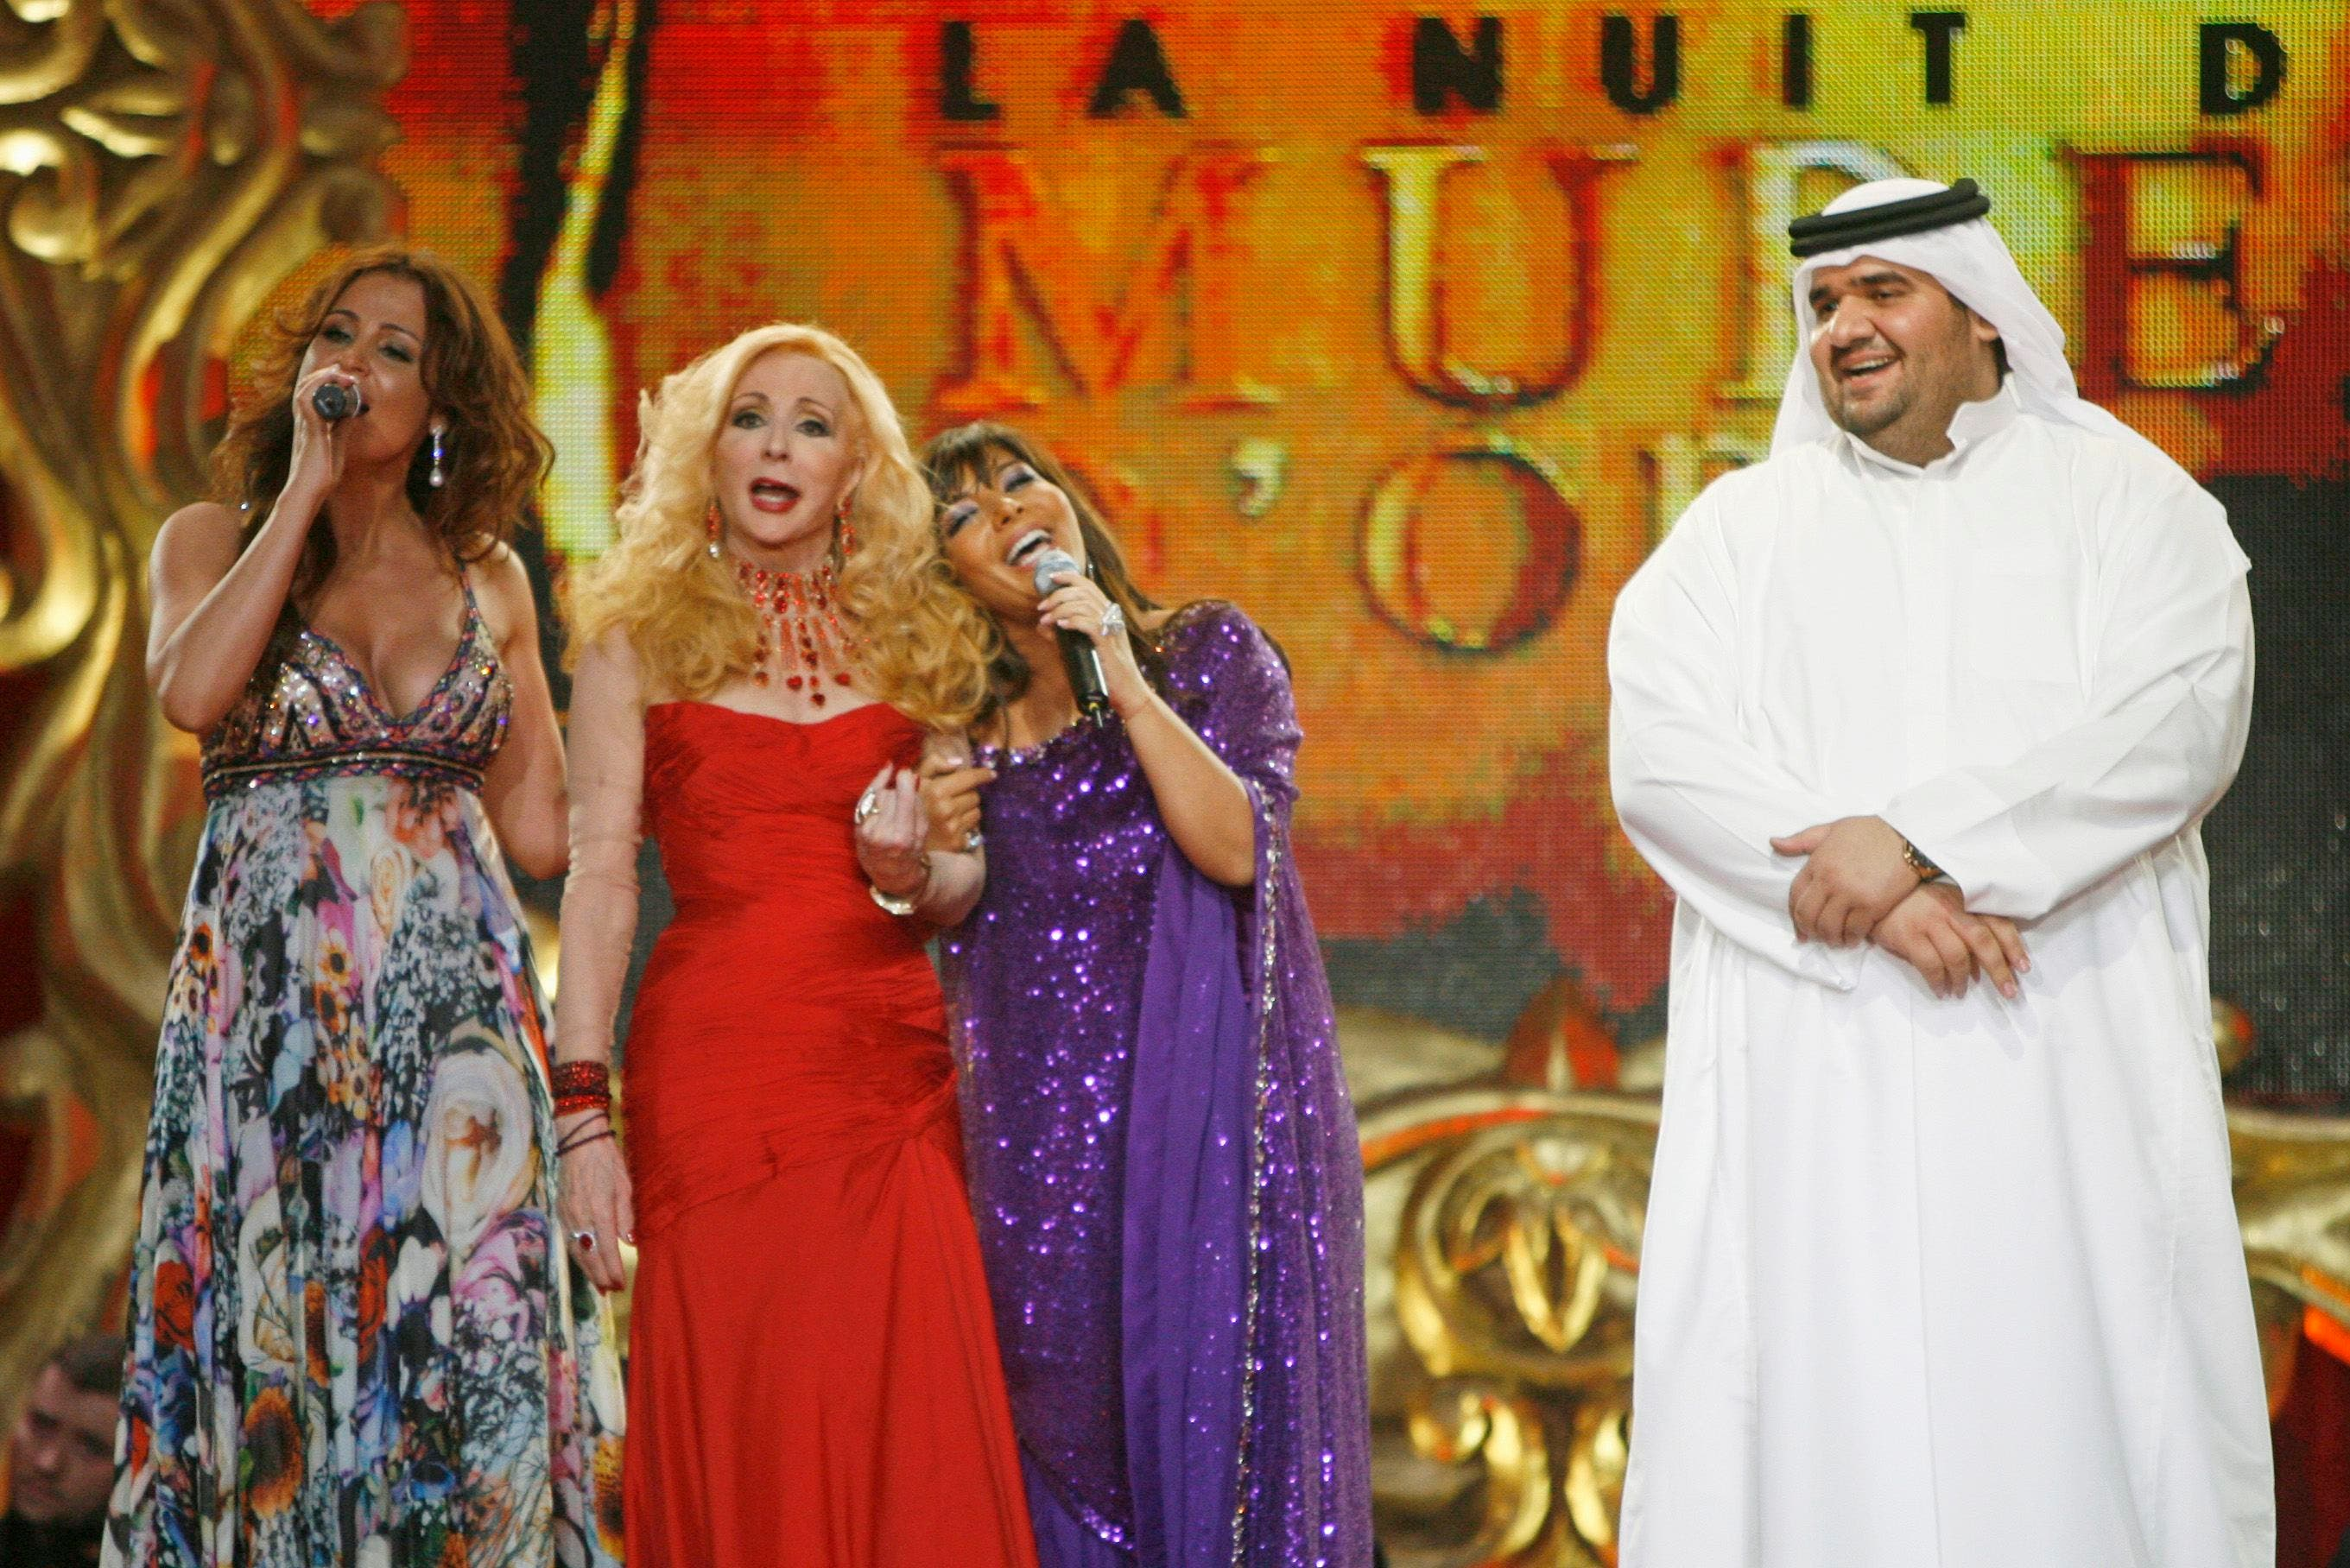 Lebanese singer Carole Samaha (L), Lebanse singer Sabah (2nd L), Syrian singer Asala (2nd R) and Emirati singer Hussein al- Jasmi (R) perfom at the Casino du Liban, north of Beirut, in this June 20, 2008 file photo. (Reuters)